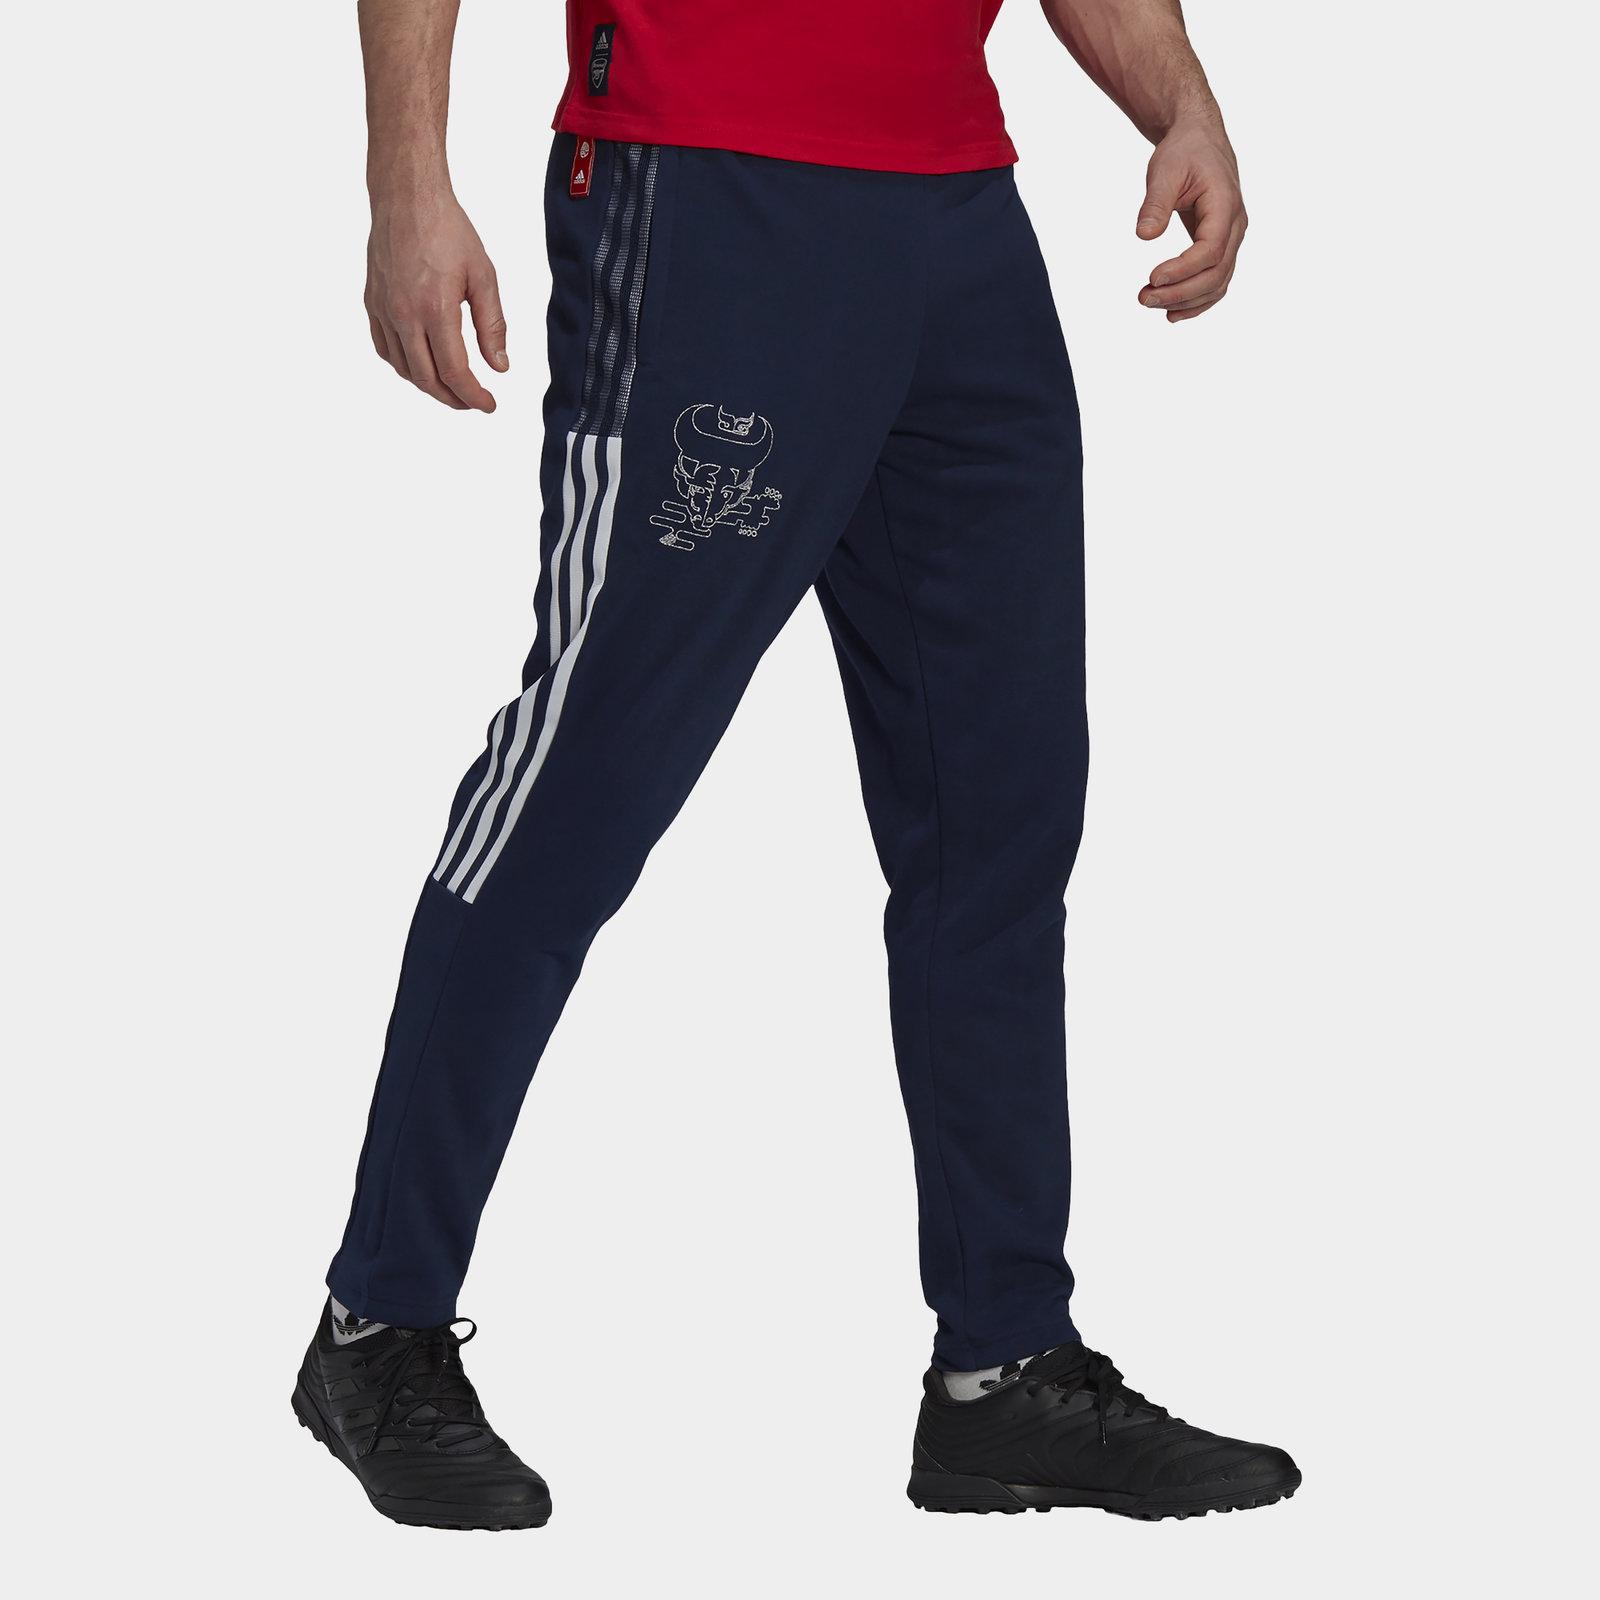 Arsenal Chinese New Year Sweatpants Mens